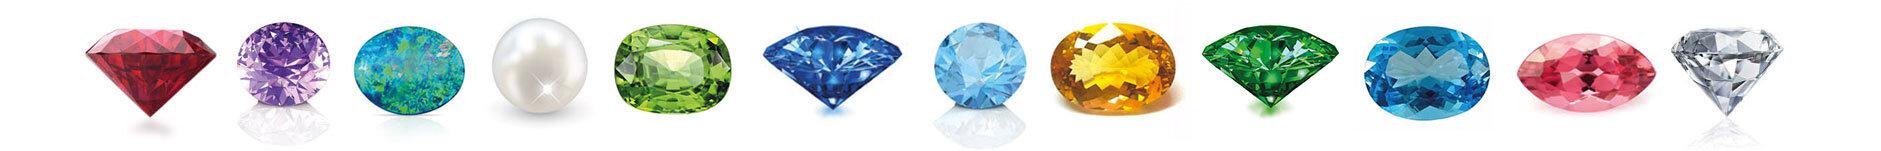 Gemstones-banner.jpg